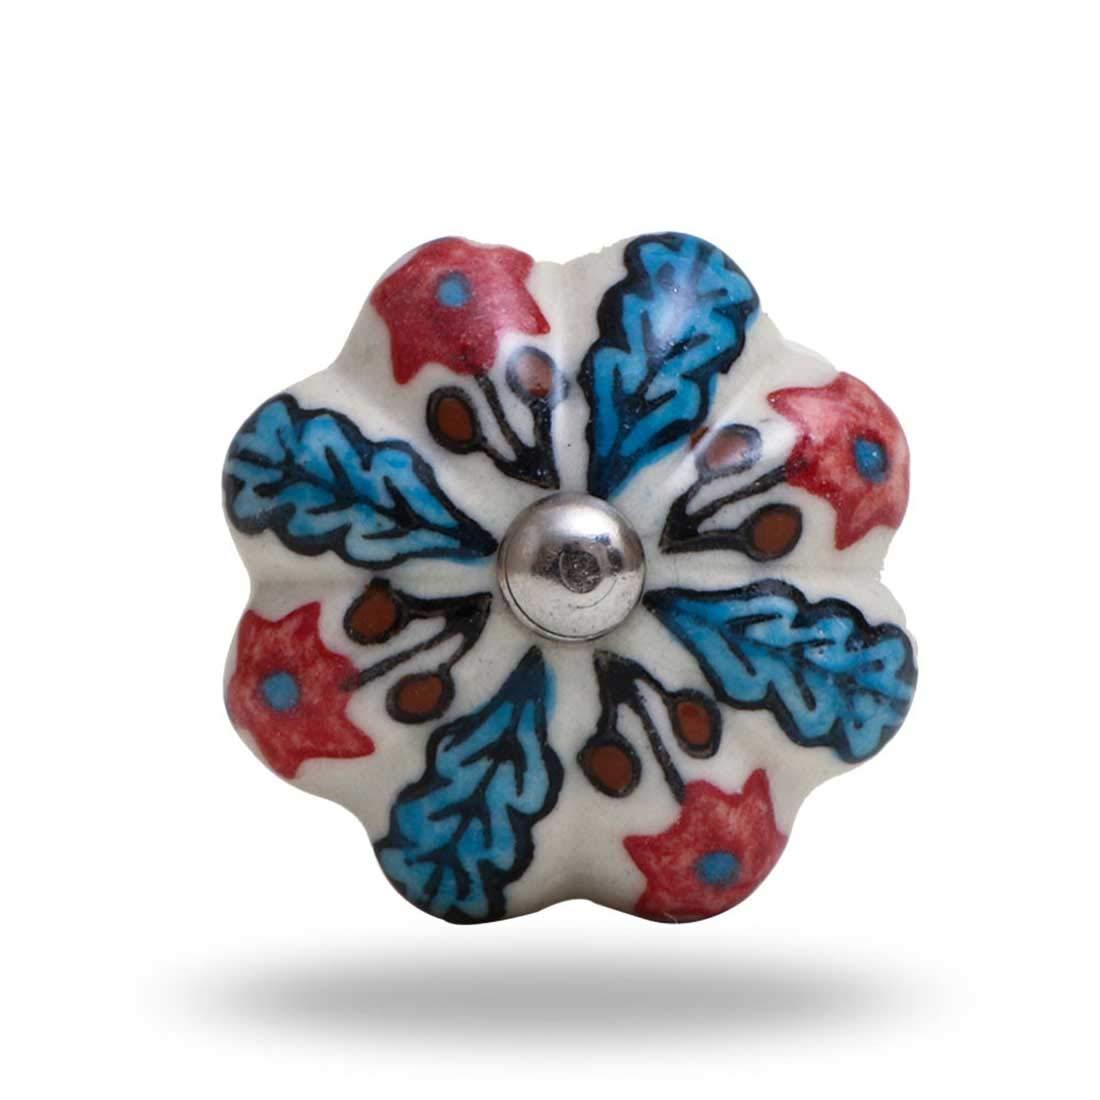 Wickham Ceramic knob Indian Handicrafts Export TCAFRORK00075